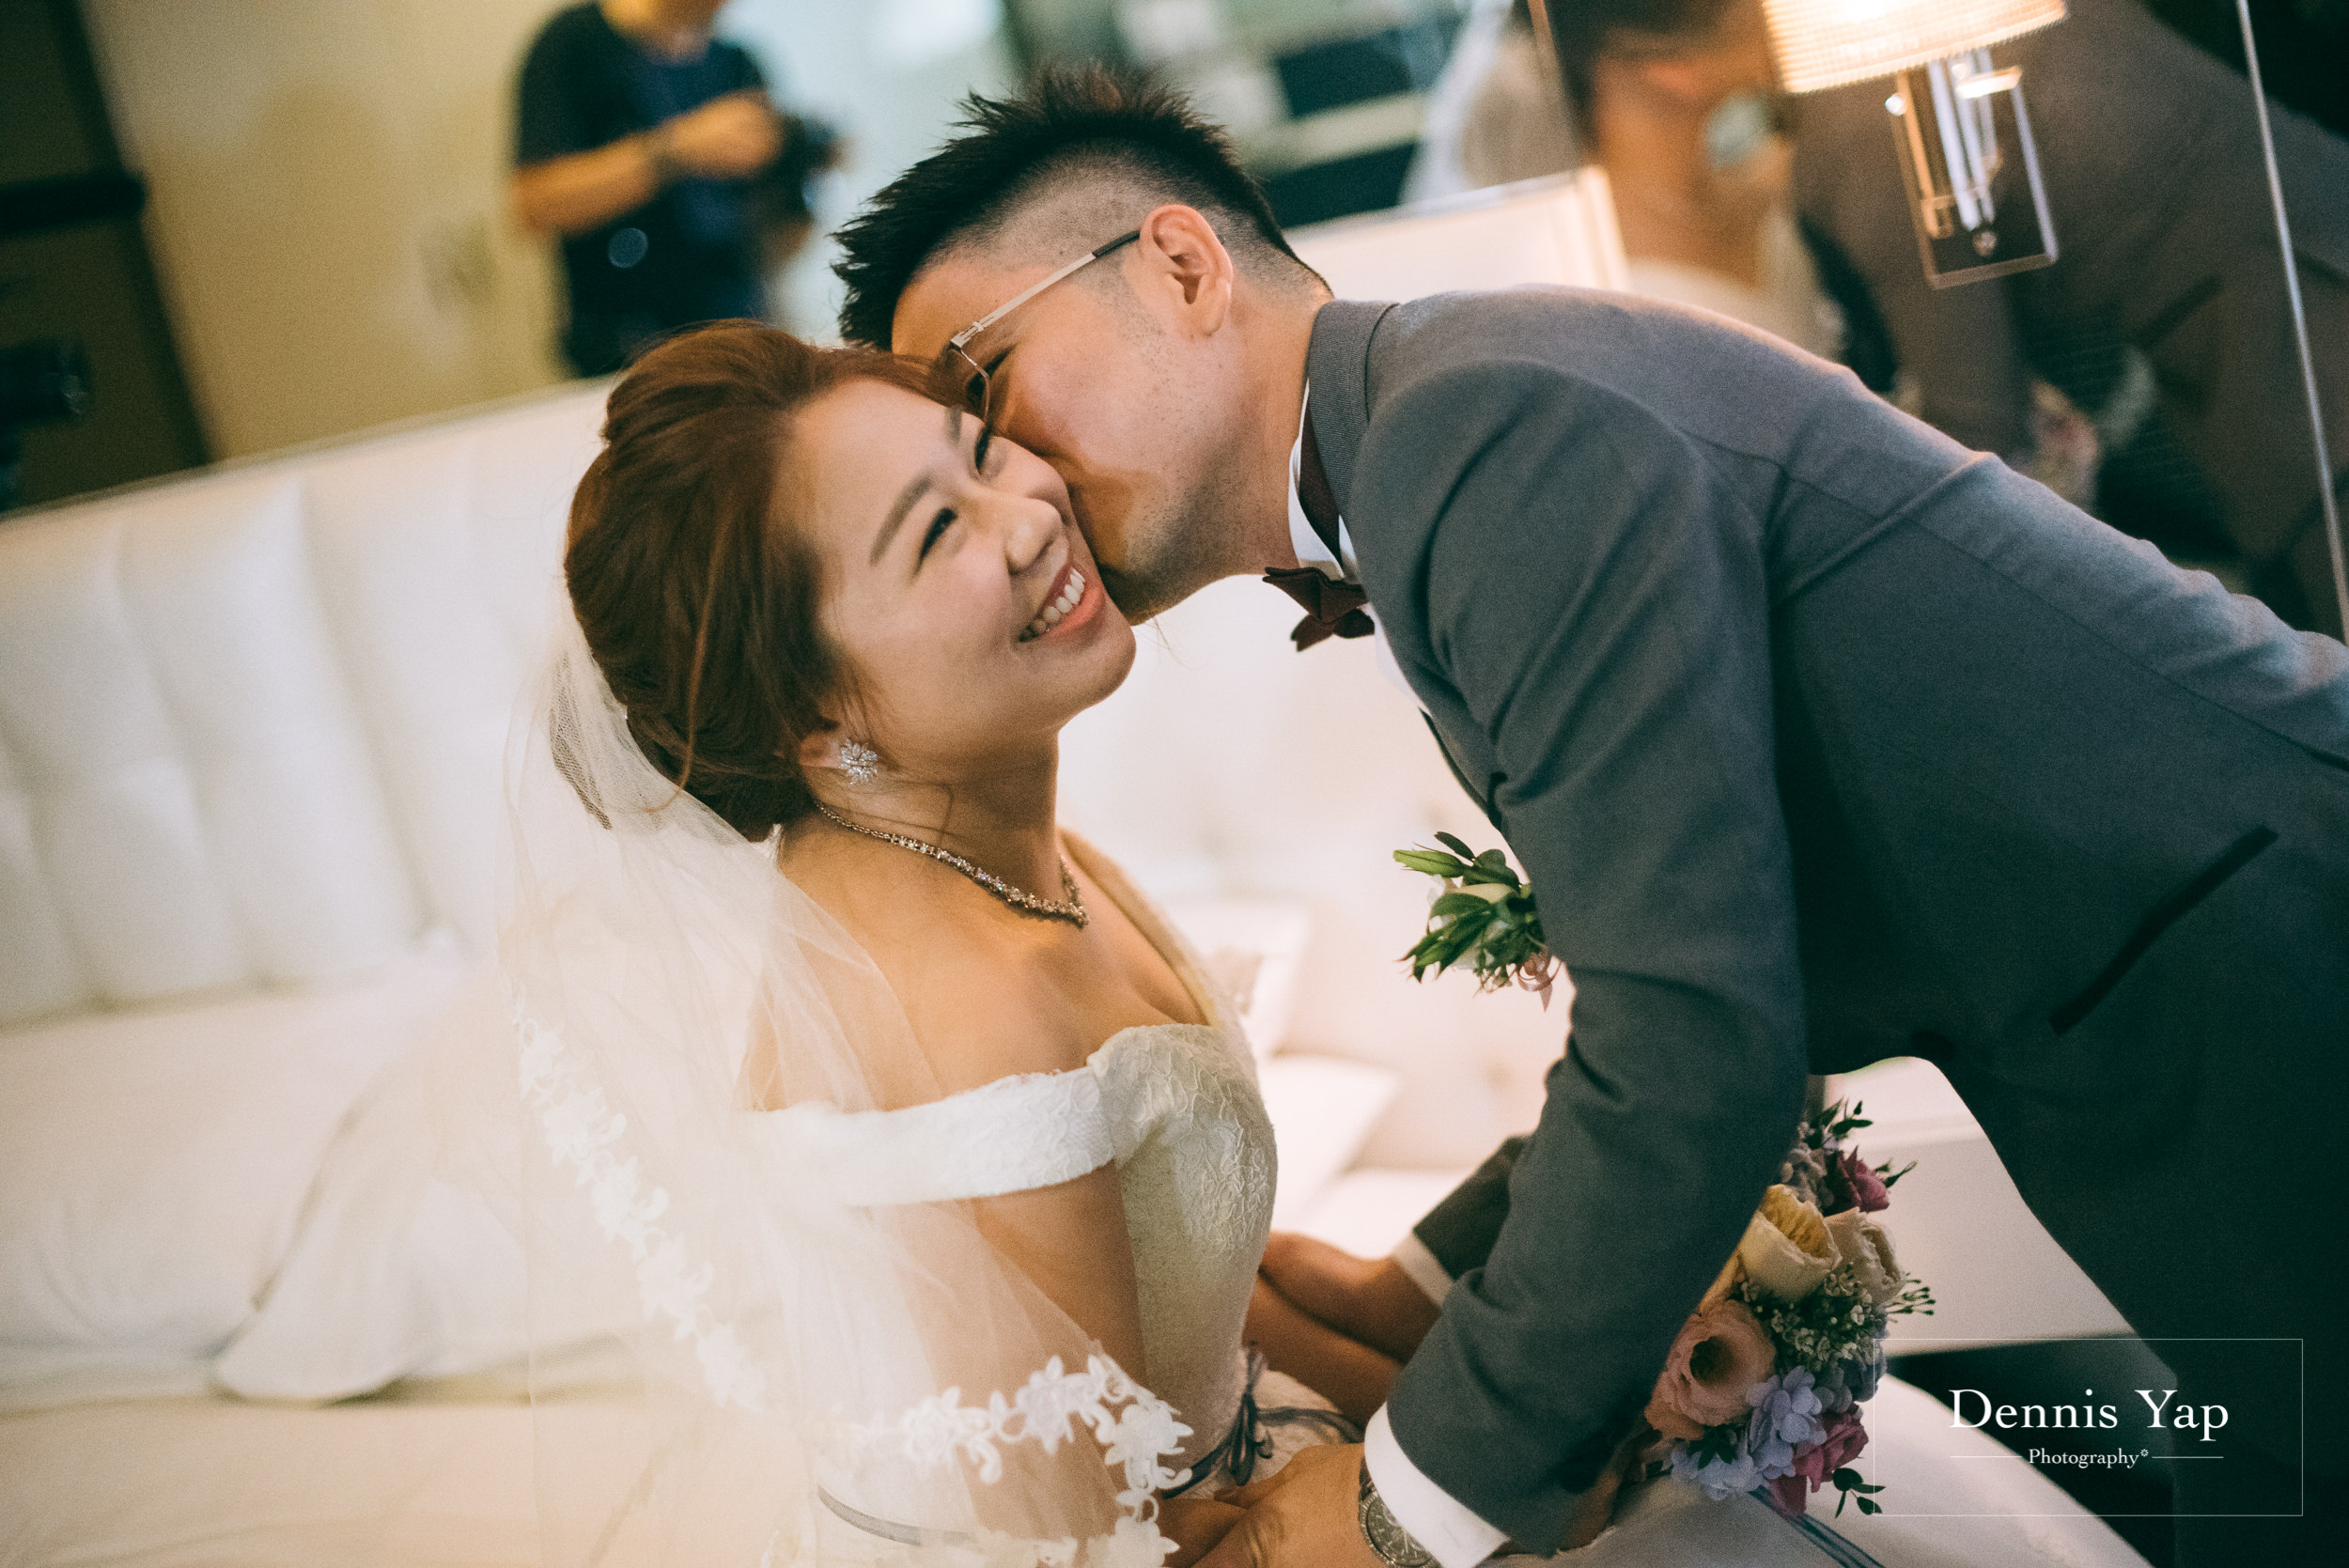 joon keat siew hui wedding day dennis yap malaysia wedding photographer-16.jpg